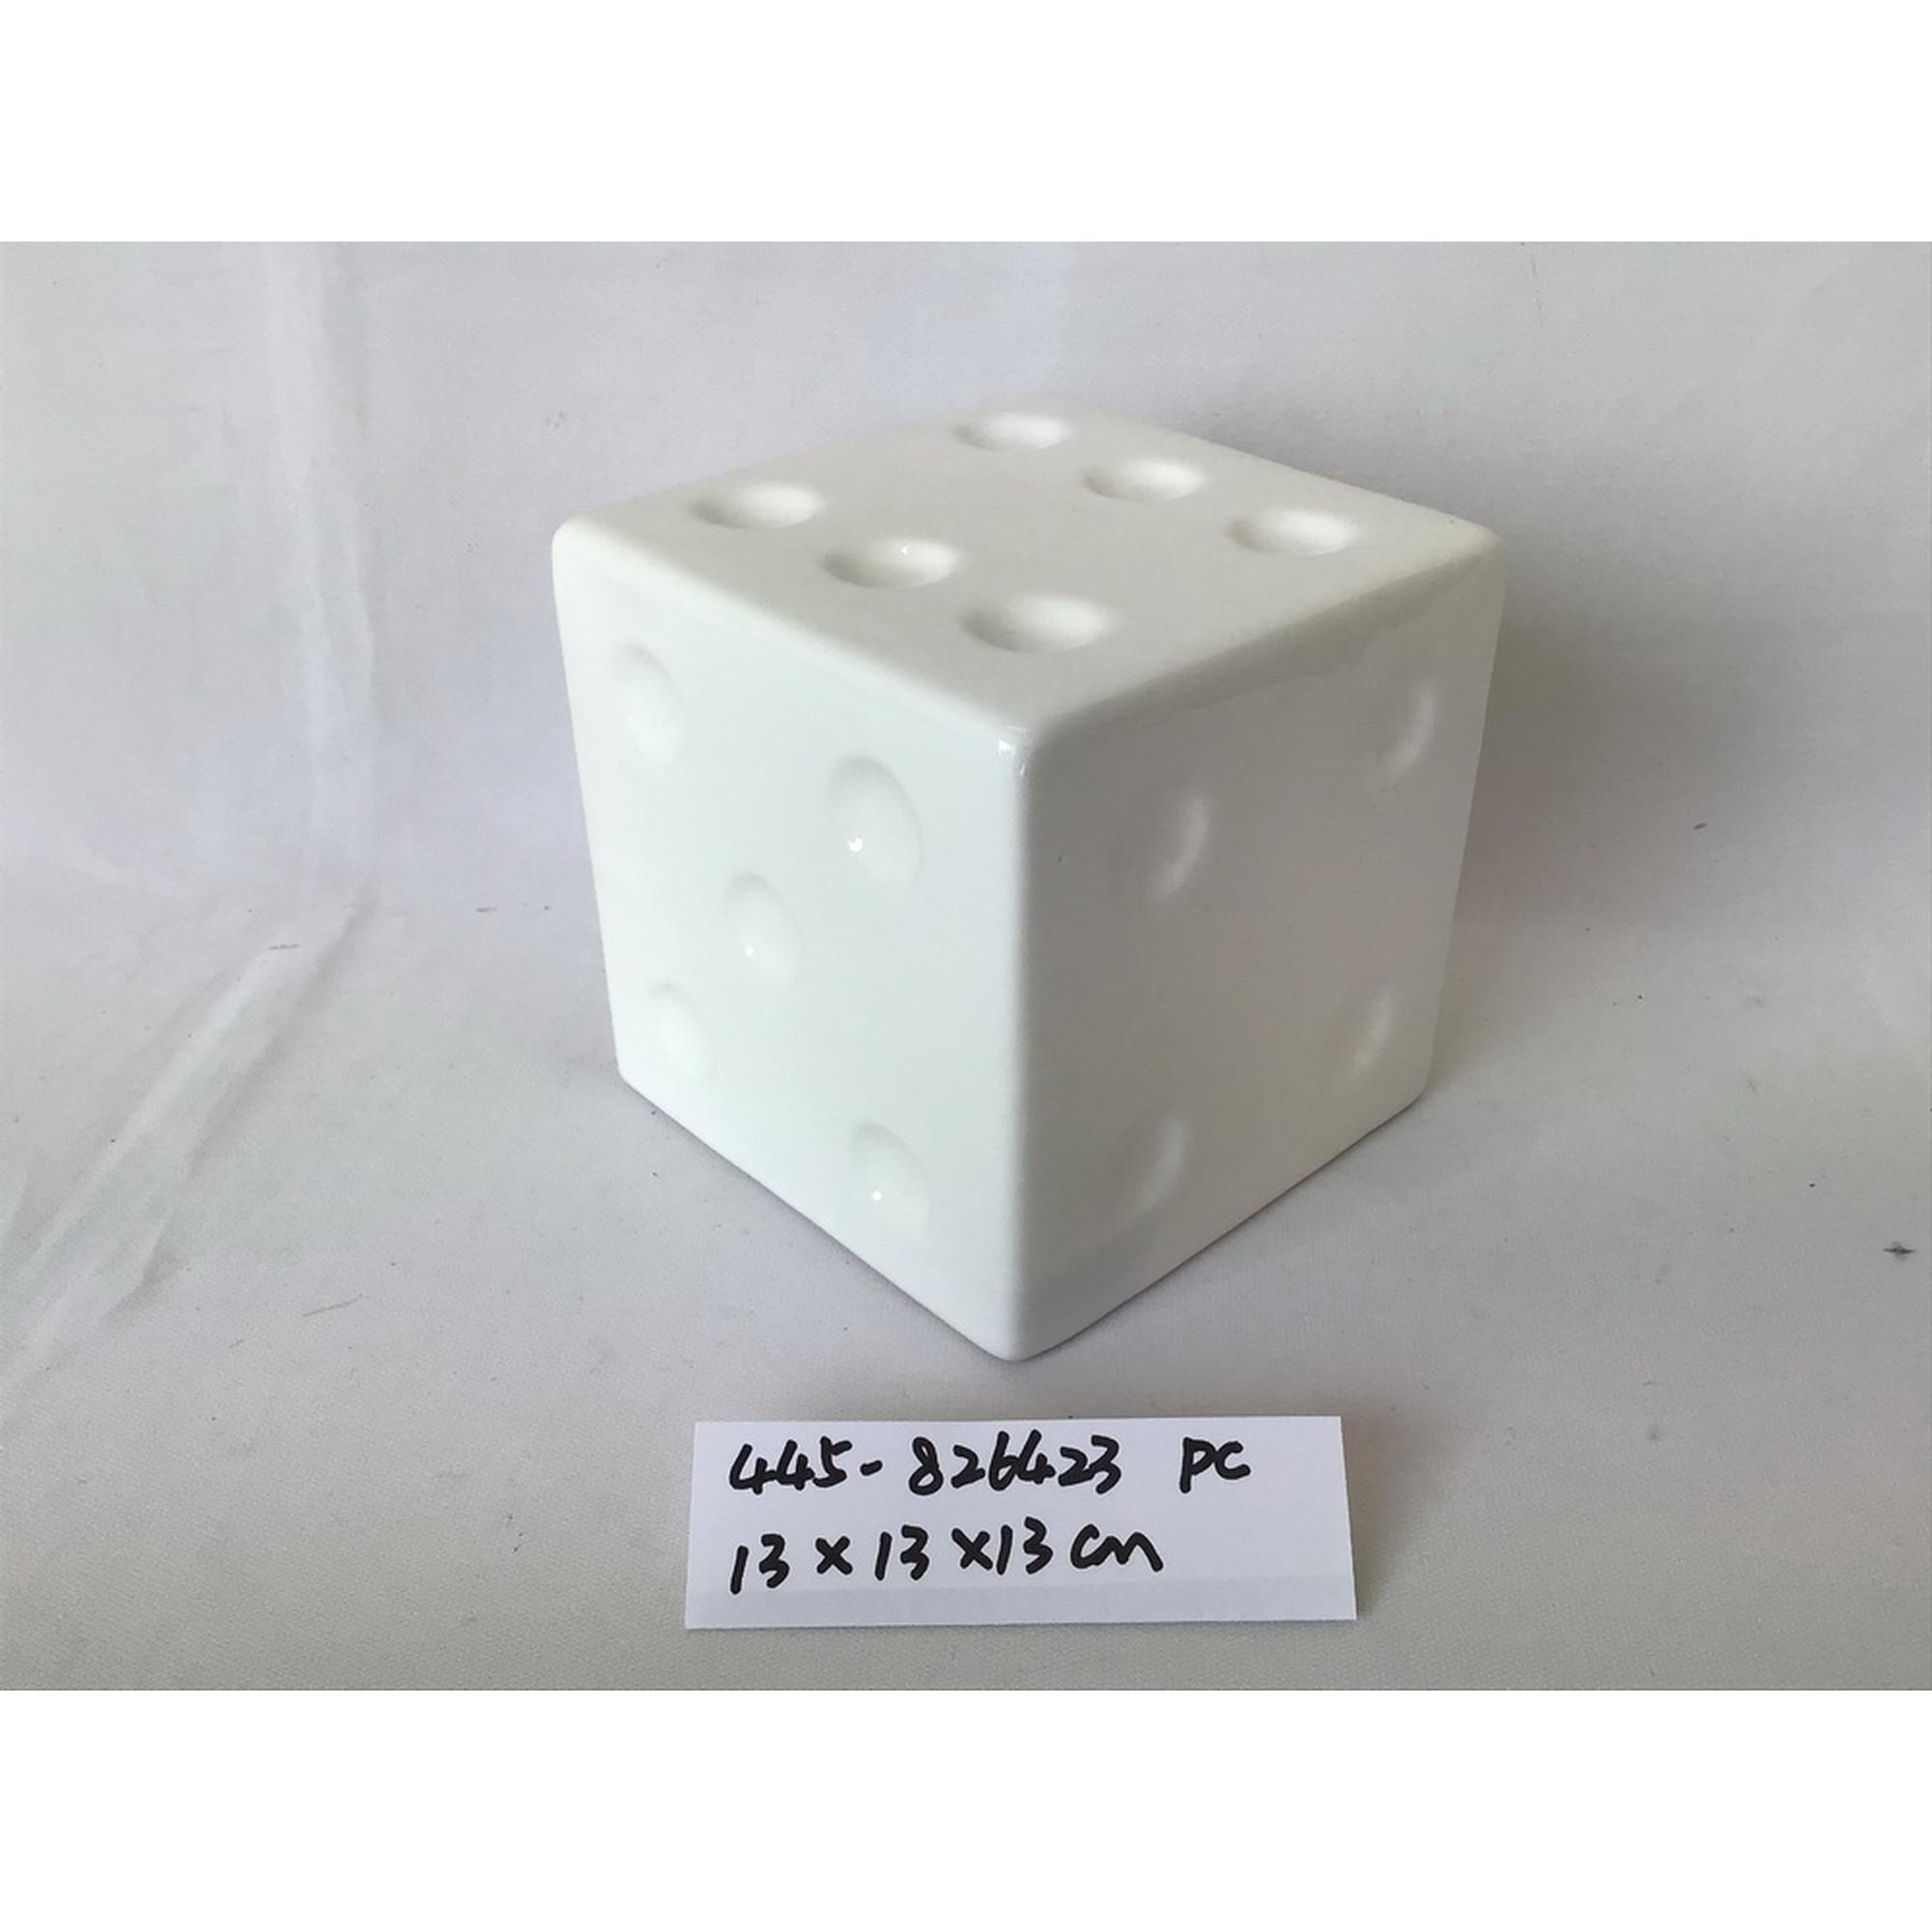 DADO DECOR 13X13X13CM - 445-826423